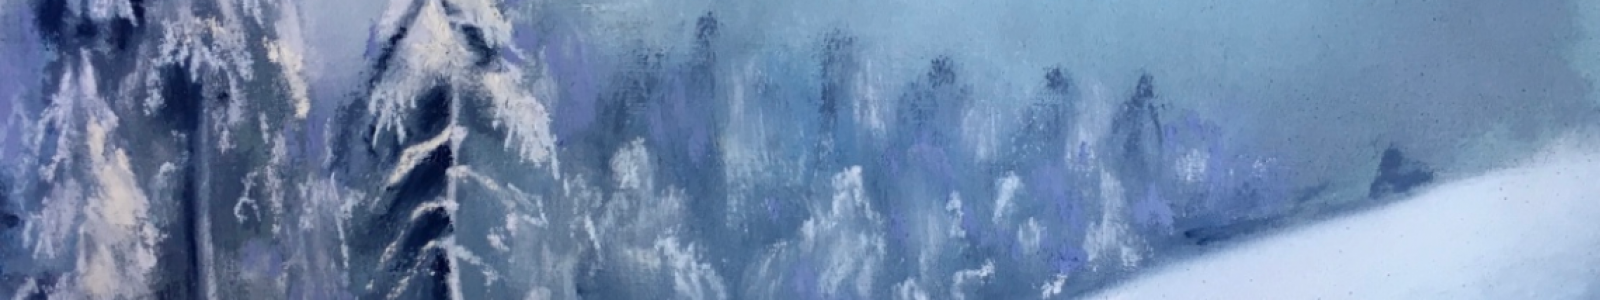 Gallery Painter Masha Novoselova